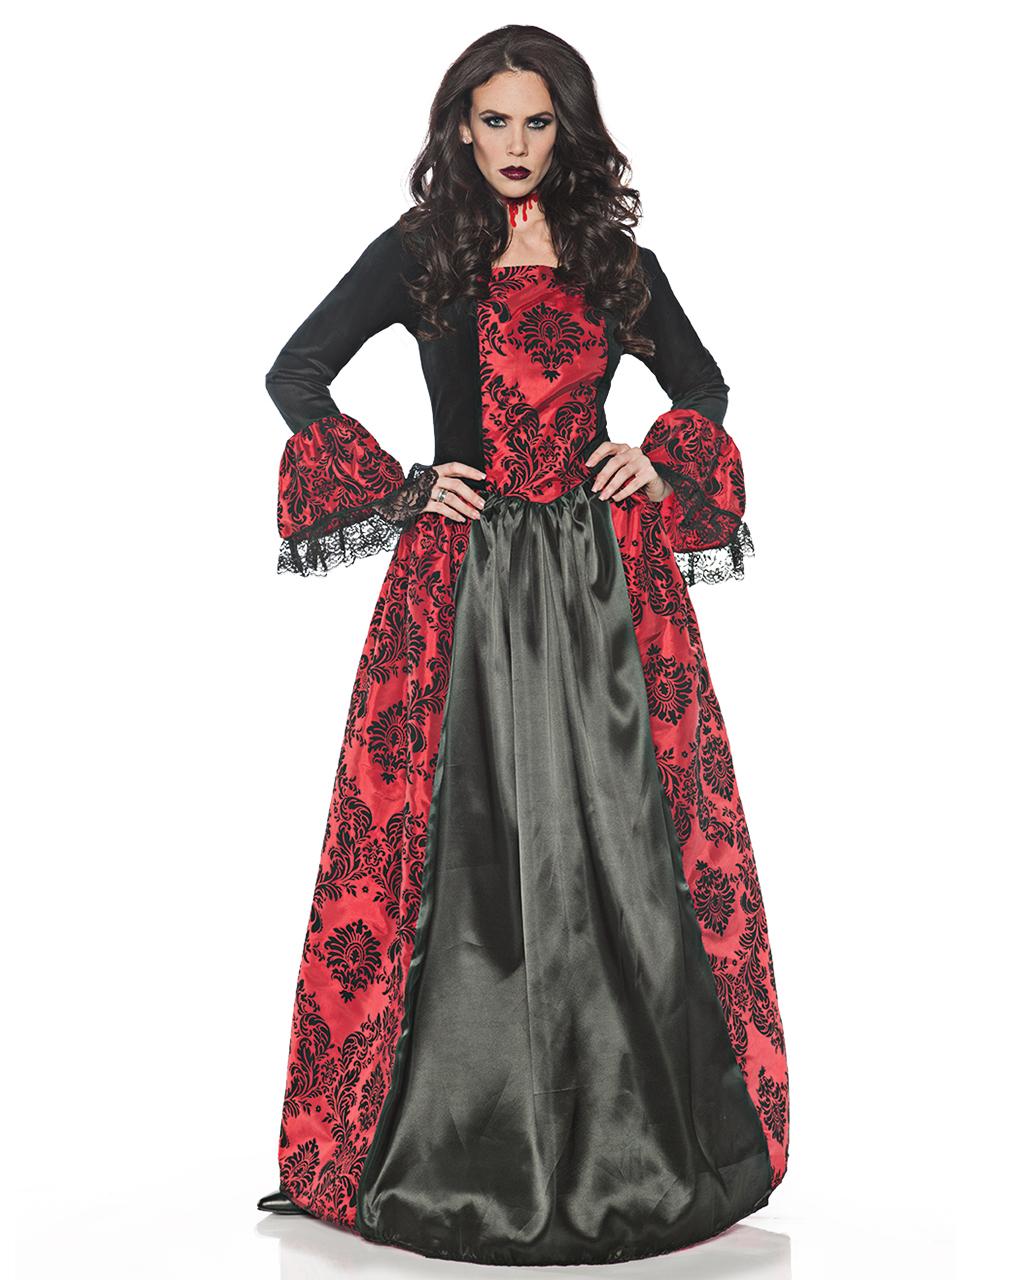 Vampire Countess Costume for Halloween | - Karneval Universe